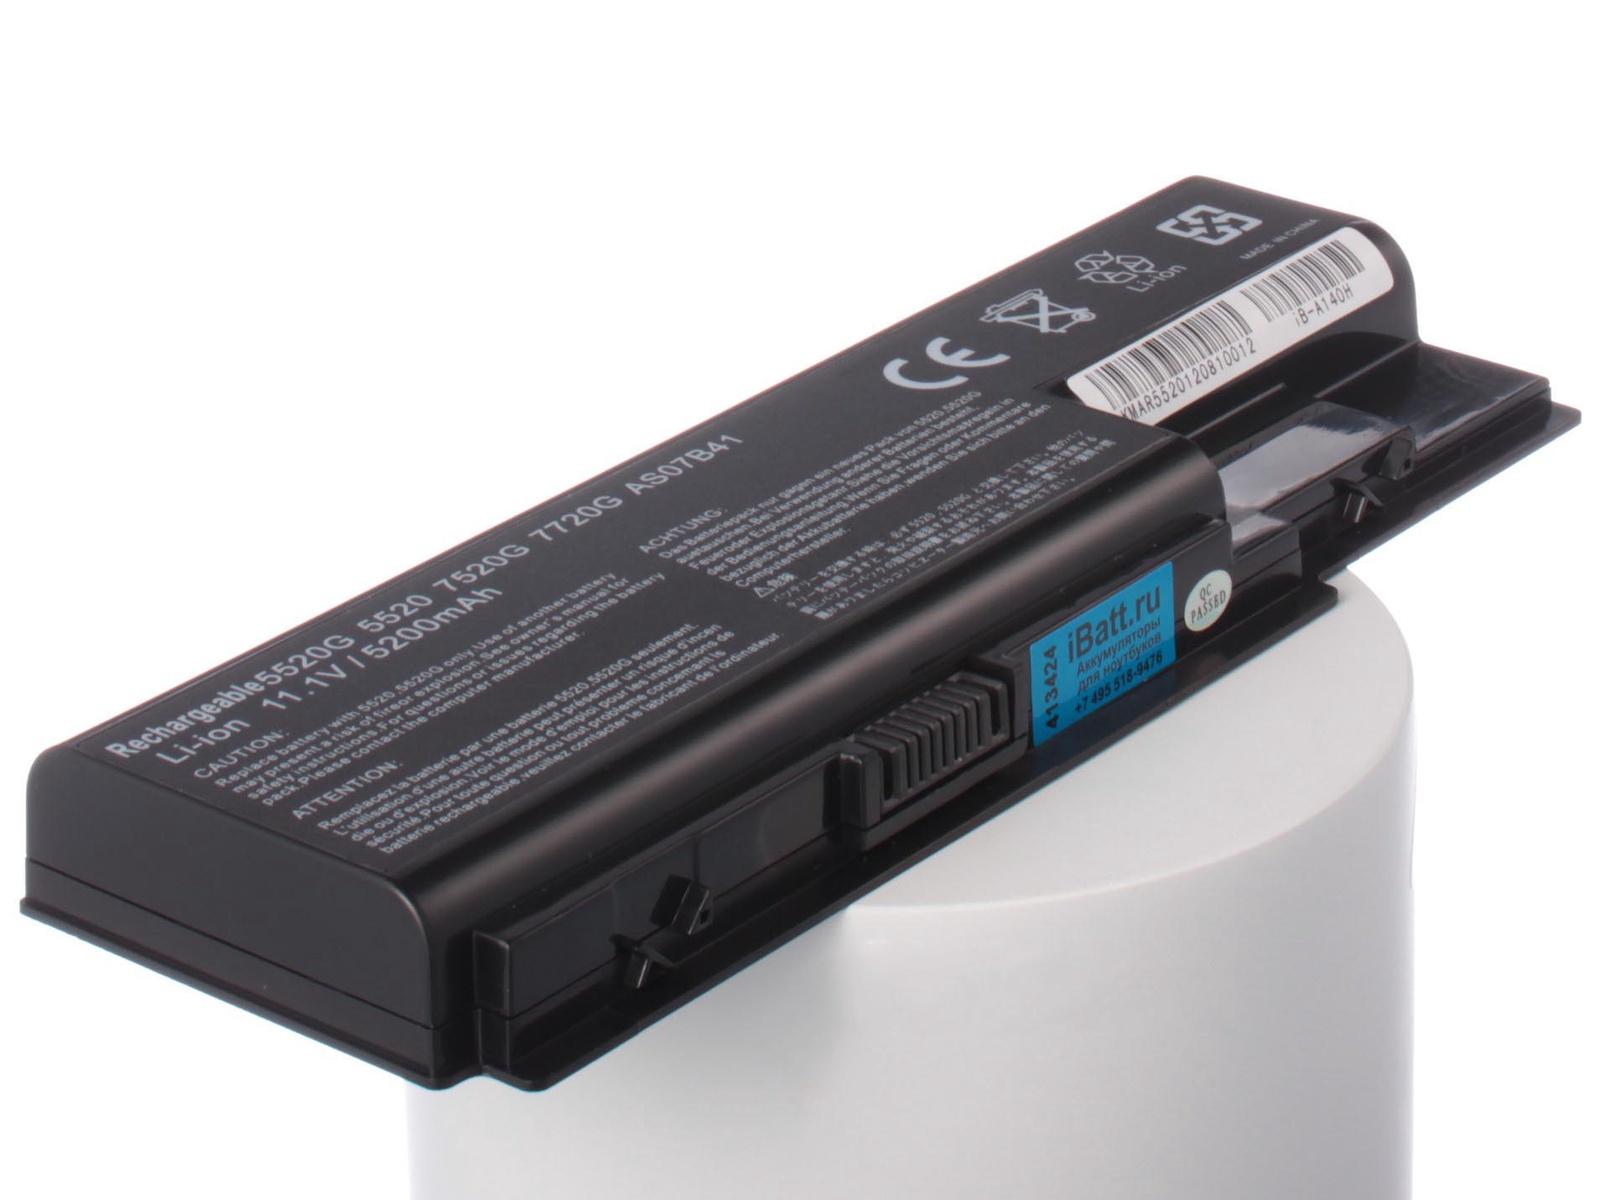 Аккумулятор для ноутбука iBatt Acer Aspire 7740G-434G50Mi, 8930G-864G64Bi, 5530G-702G25Bi, 5715Z-1A1G08Mi, 5720G-101G16Mi, 5942G-333G32Mi, 6530G-804G64Bi, 7535G-723G32Mi